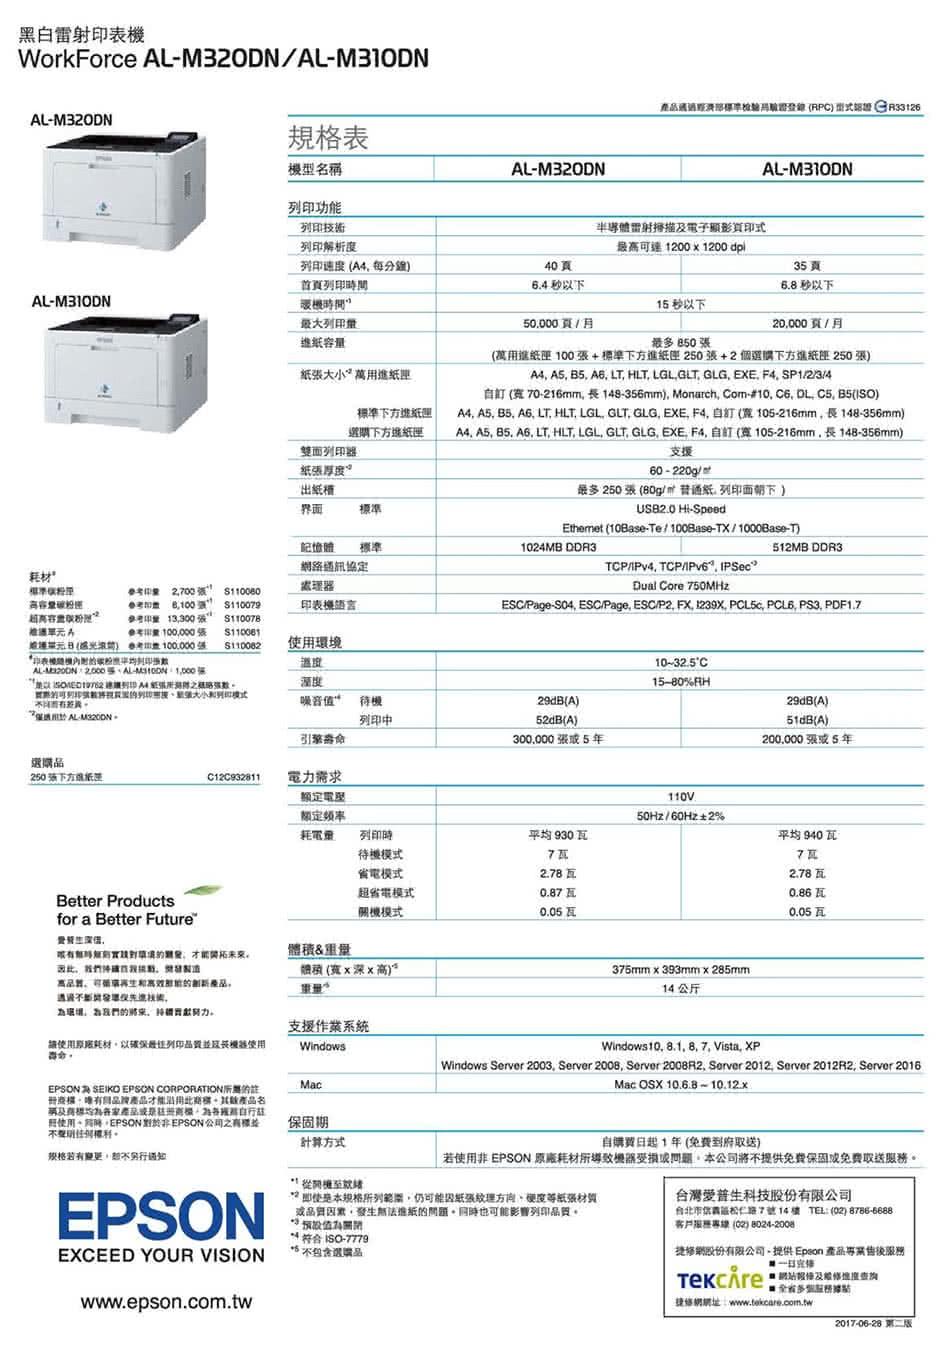 EPSON AL-M310DN 黑白雷射印表機